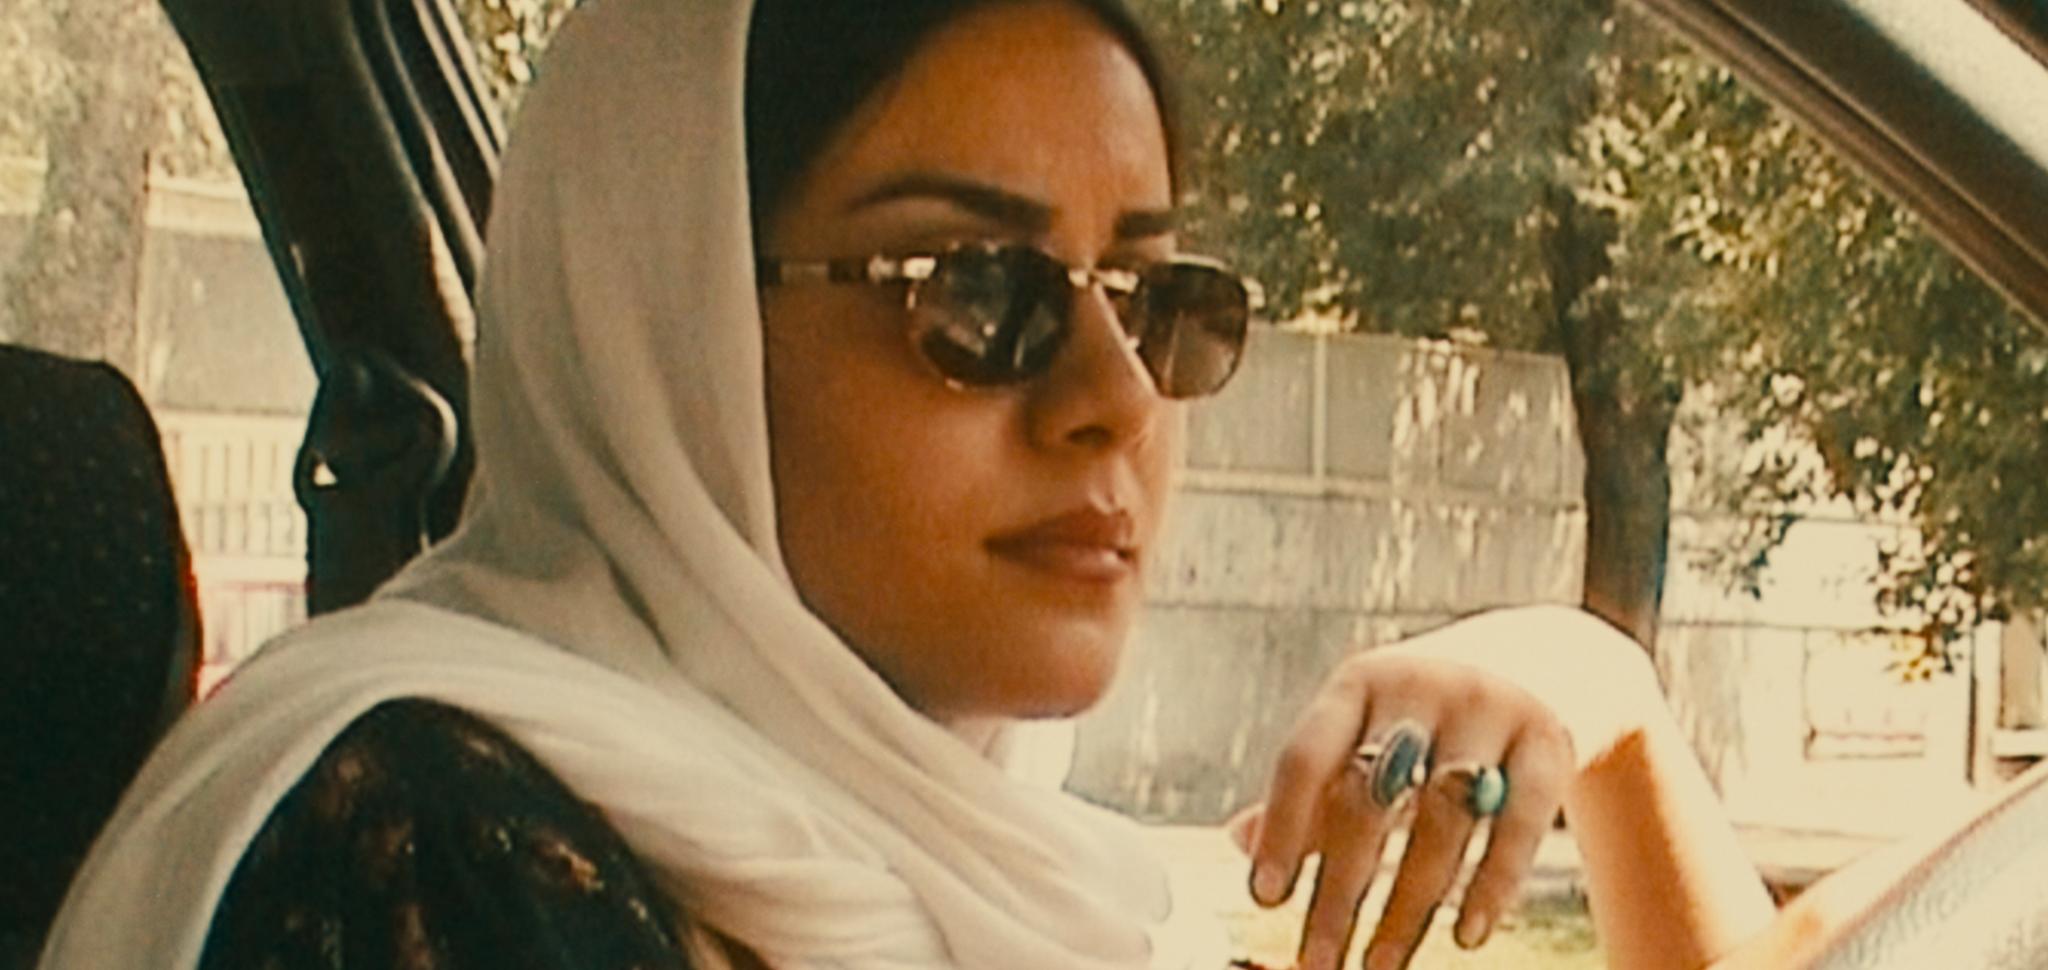 Mania Akbari driving around in a still from 'Ten' (2002)